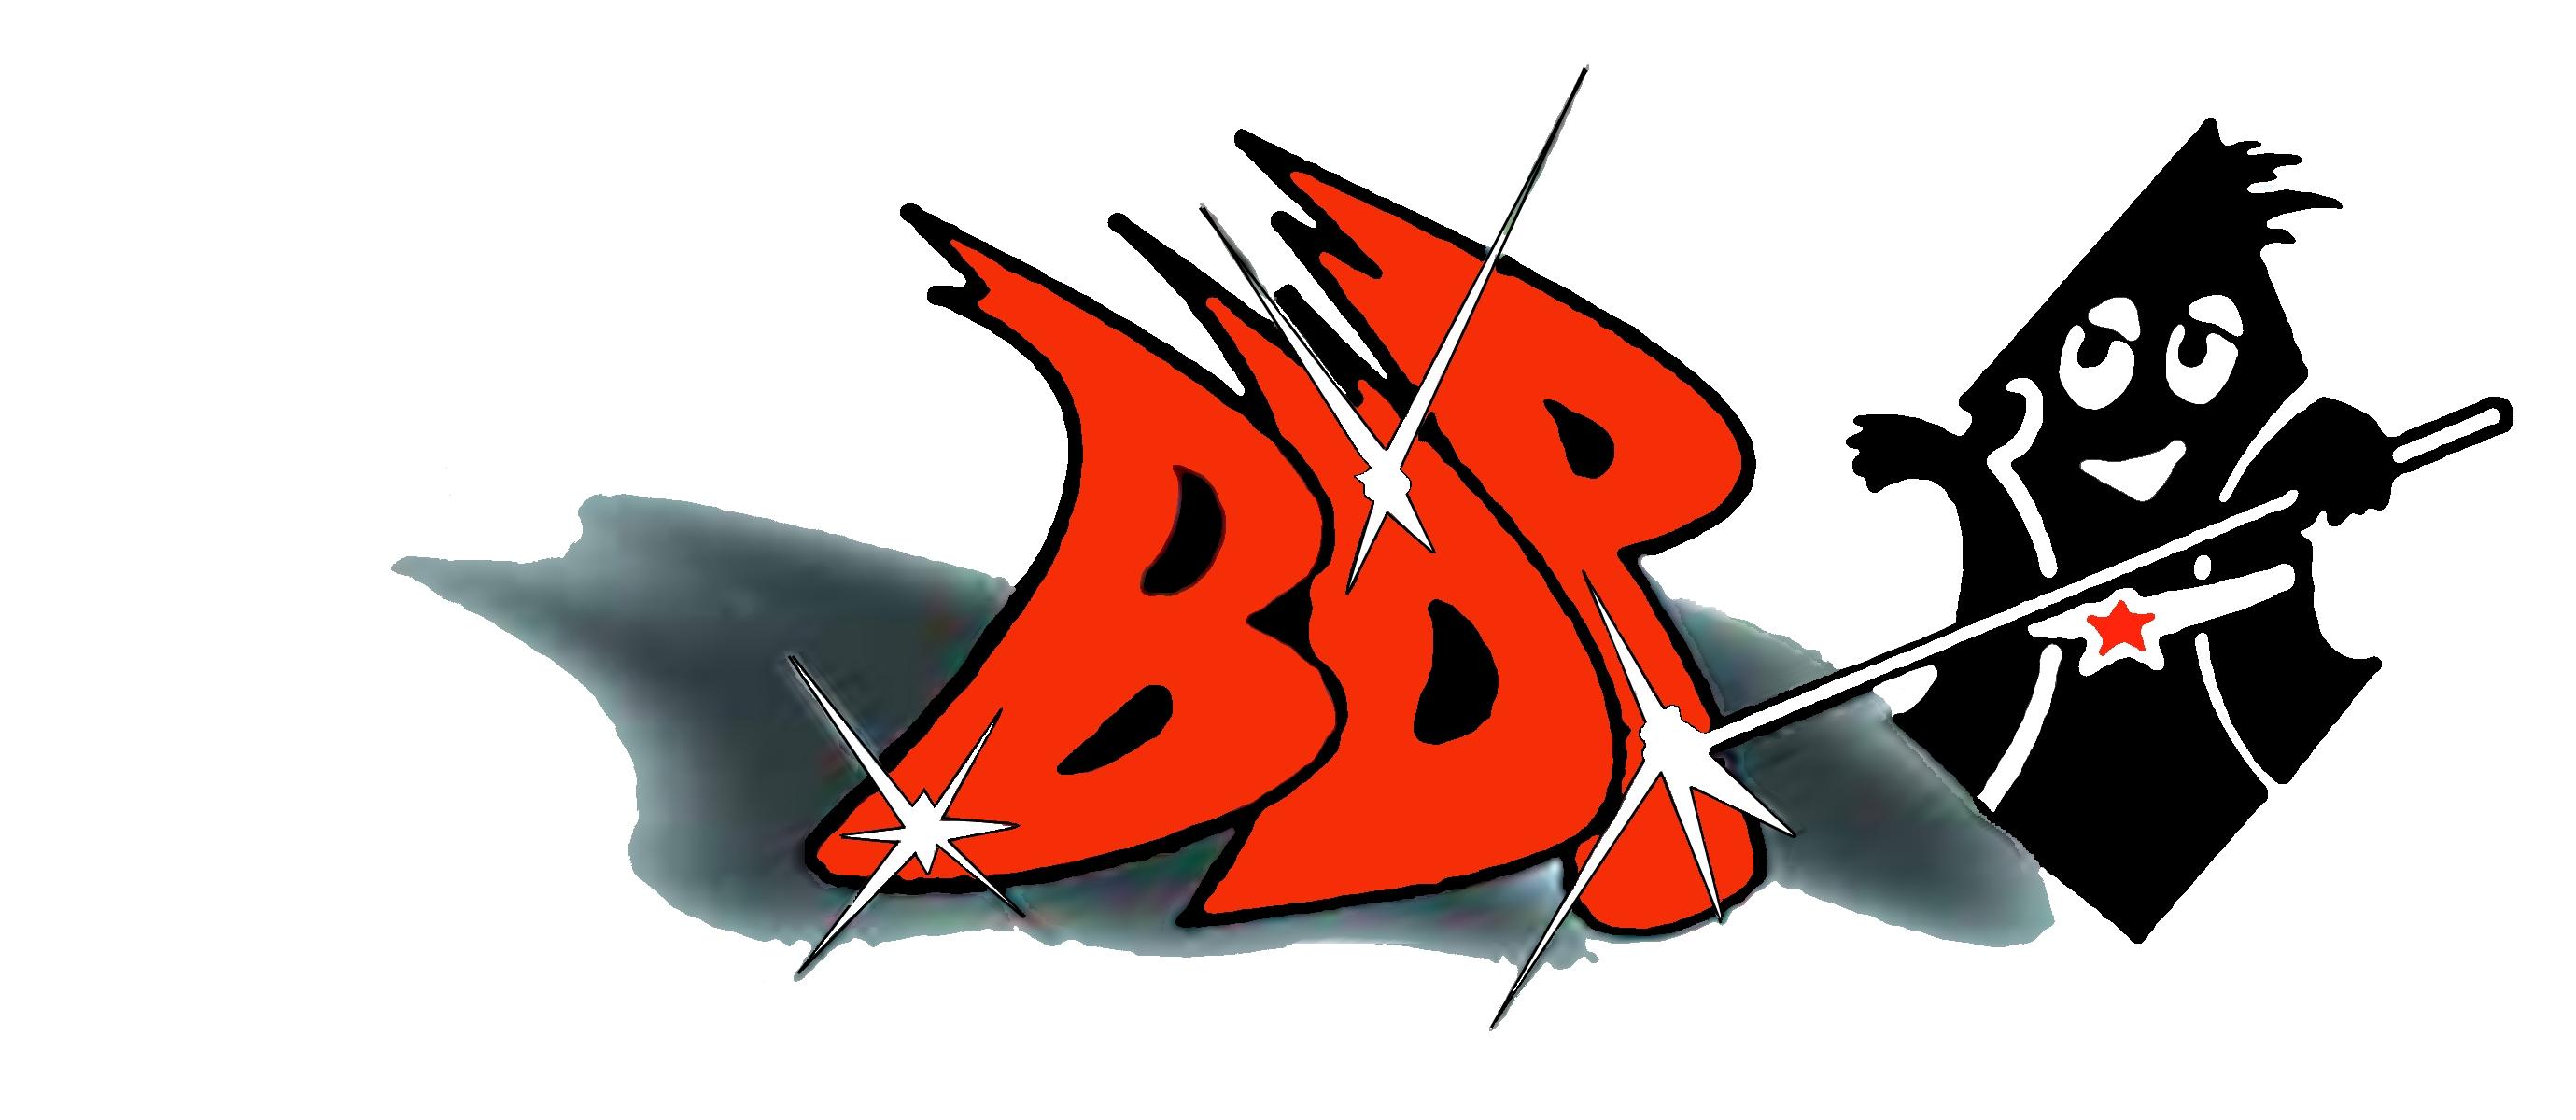 BDP Ansprechpartner kiezorientierter Mehrfachtäter